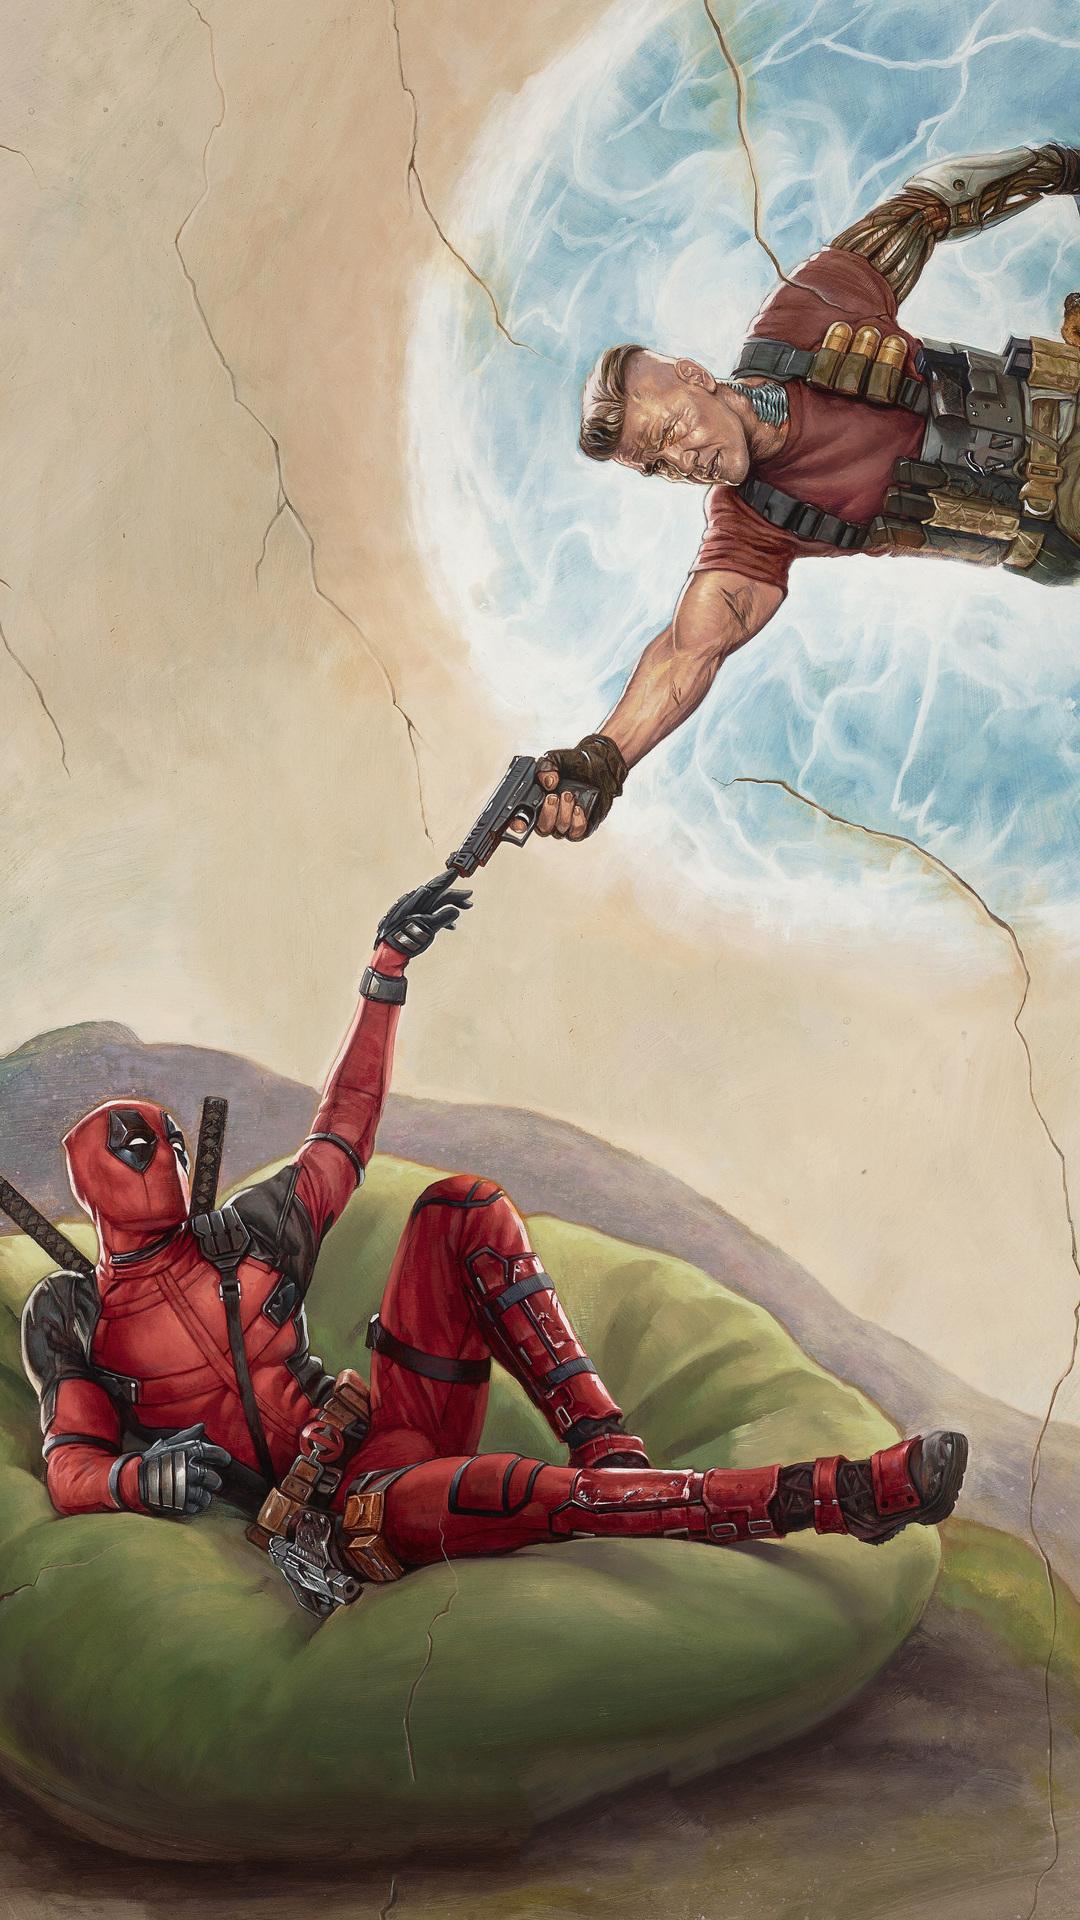 1080x1920 Deadpool 2 2018 Movie Poster Iphone 7 6s 6 Plus Pixel Xl